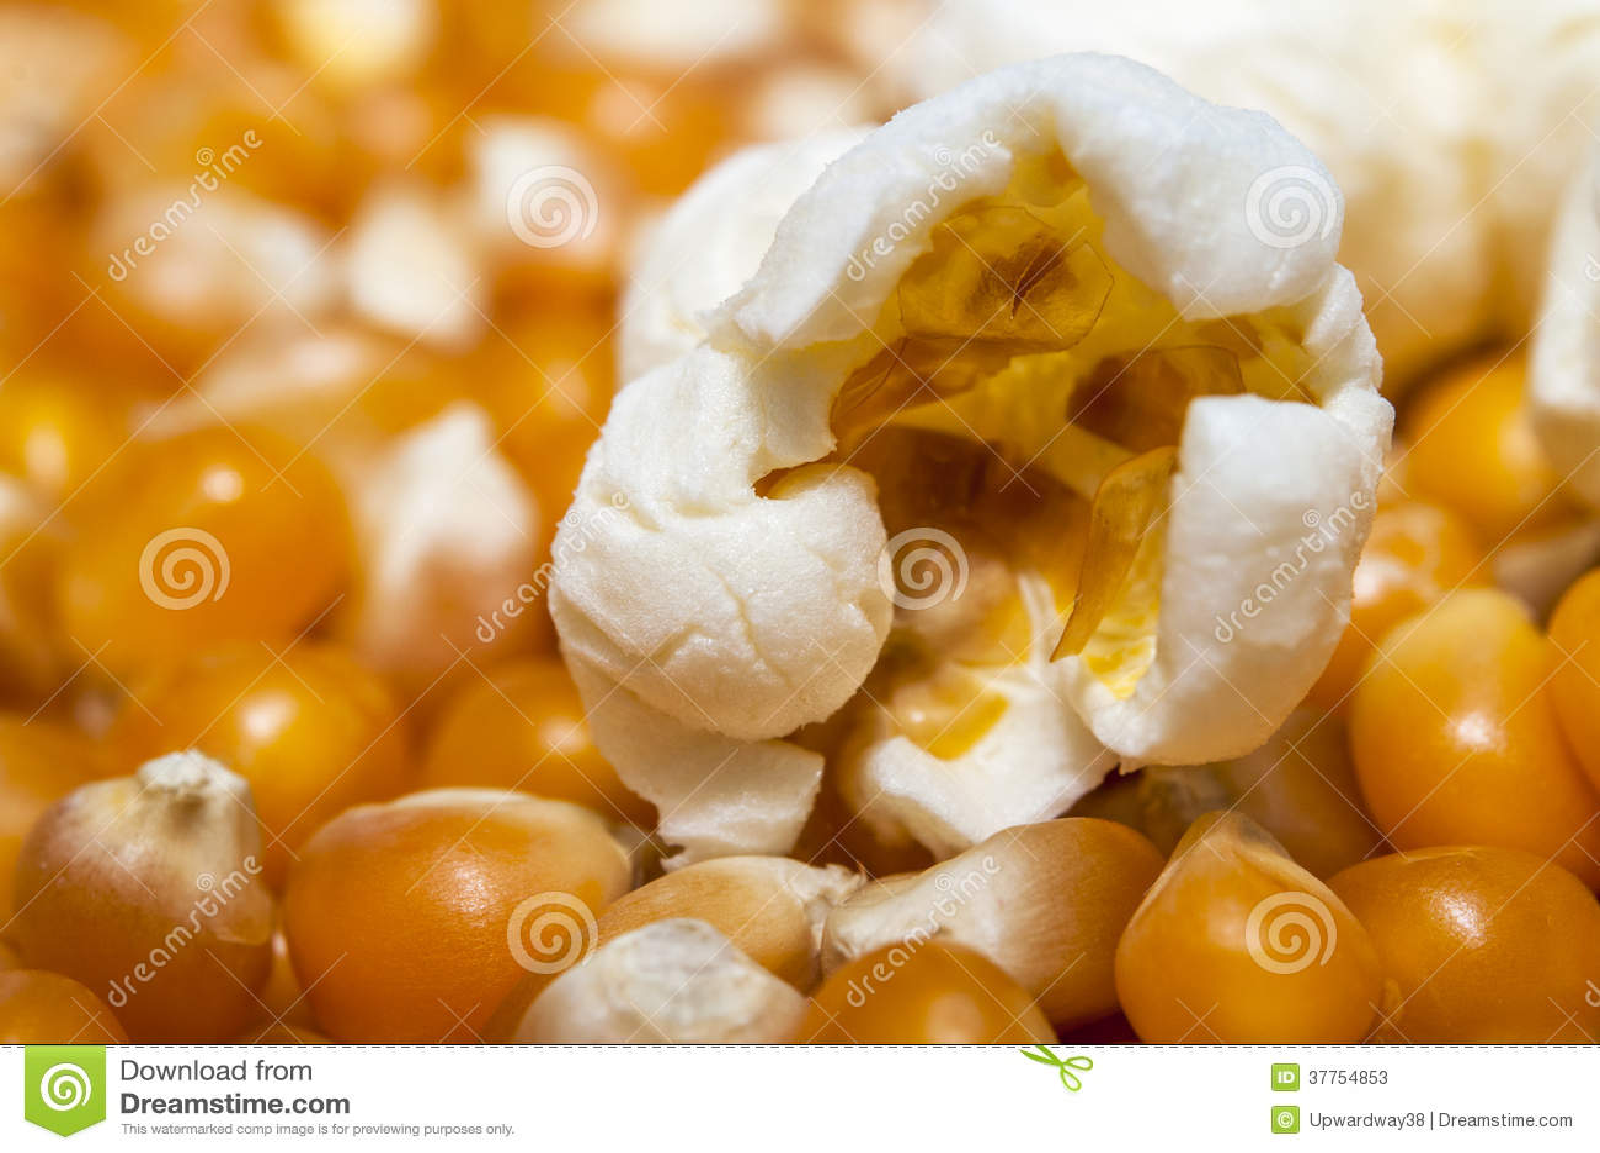 Unpopped Popcorn Kernel Clipart close- up popcorn